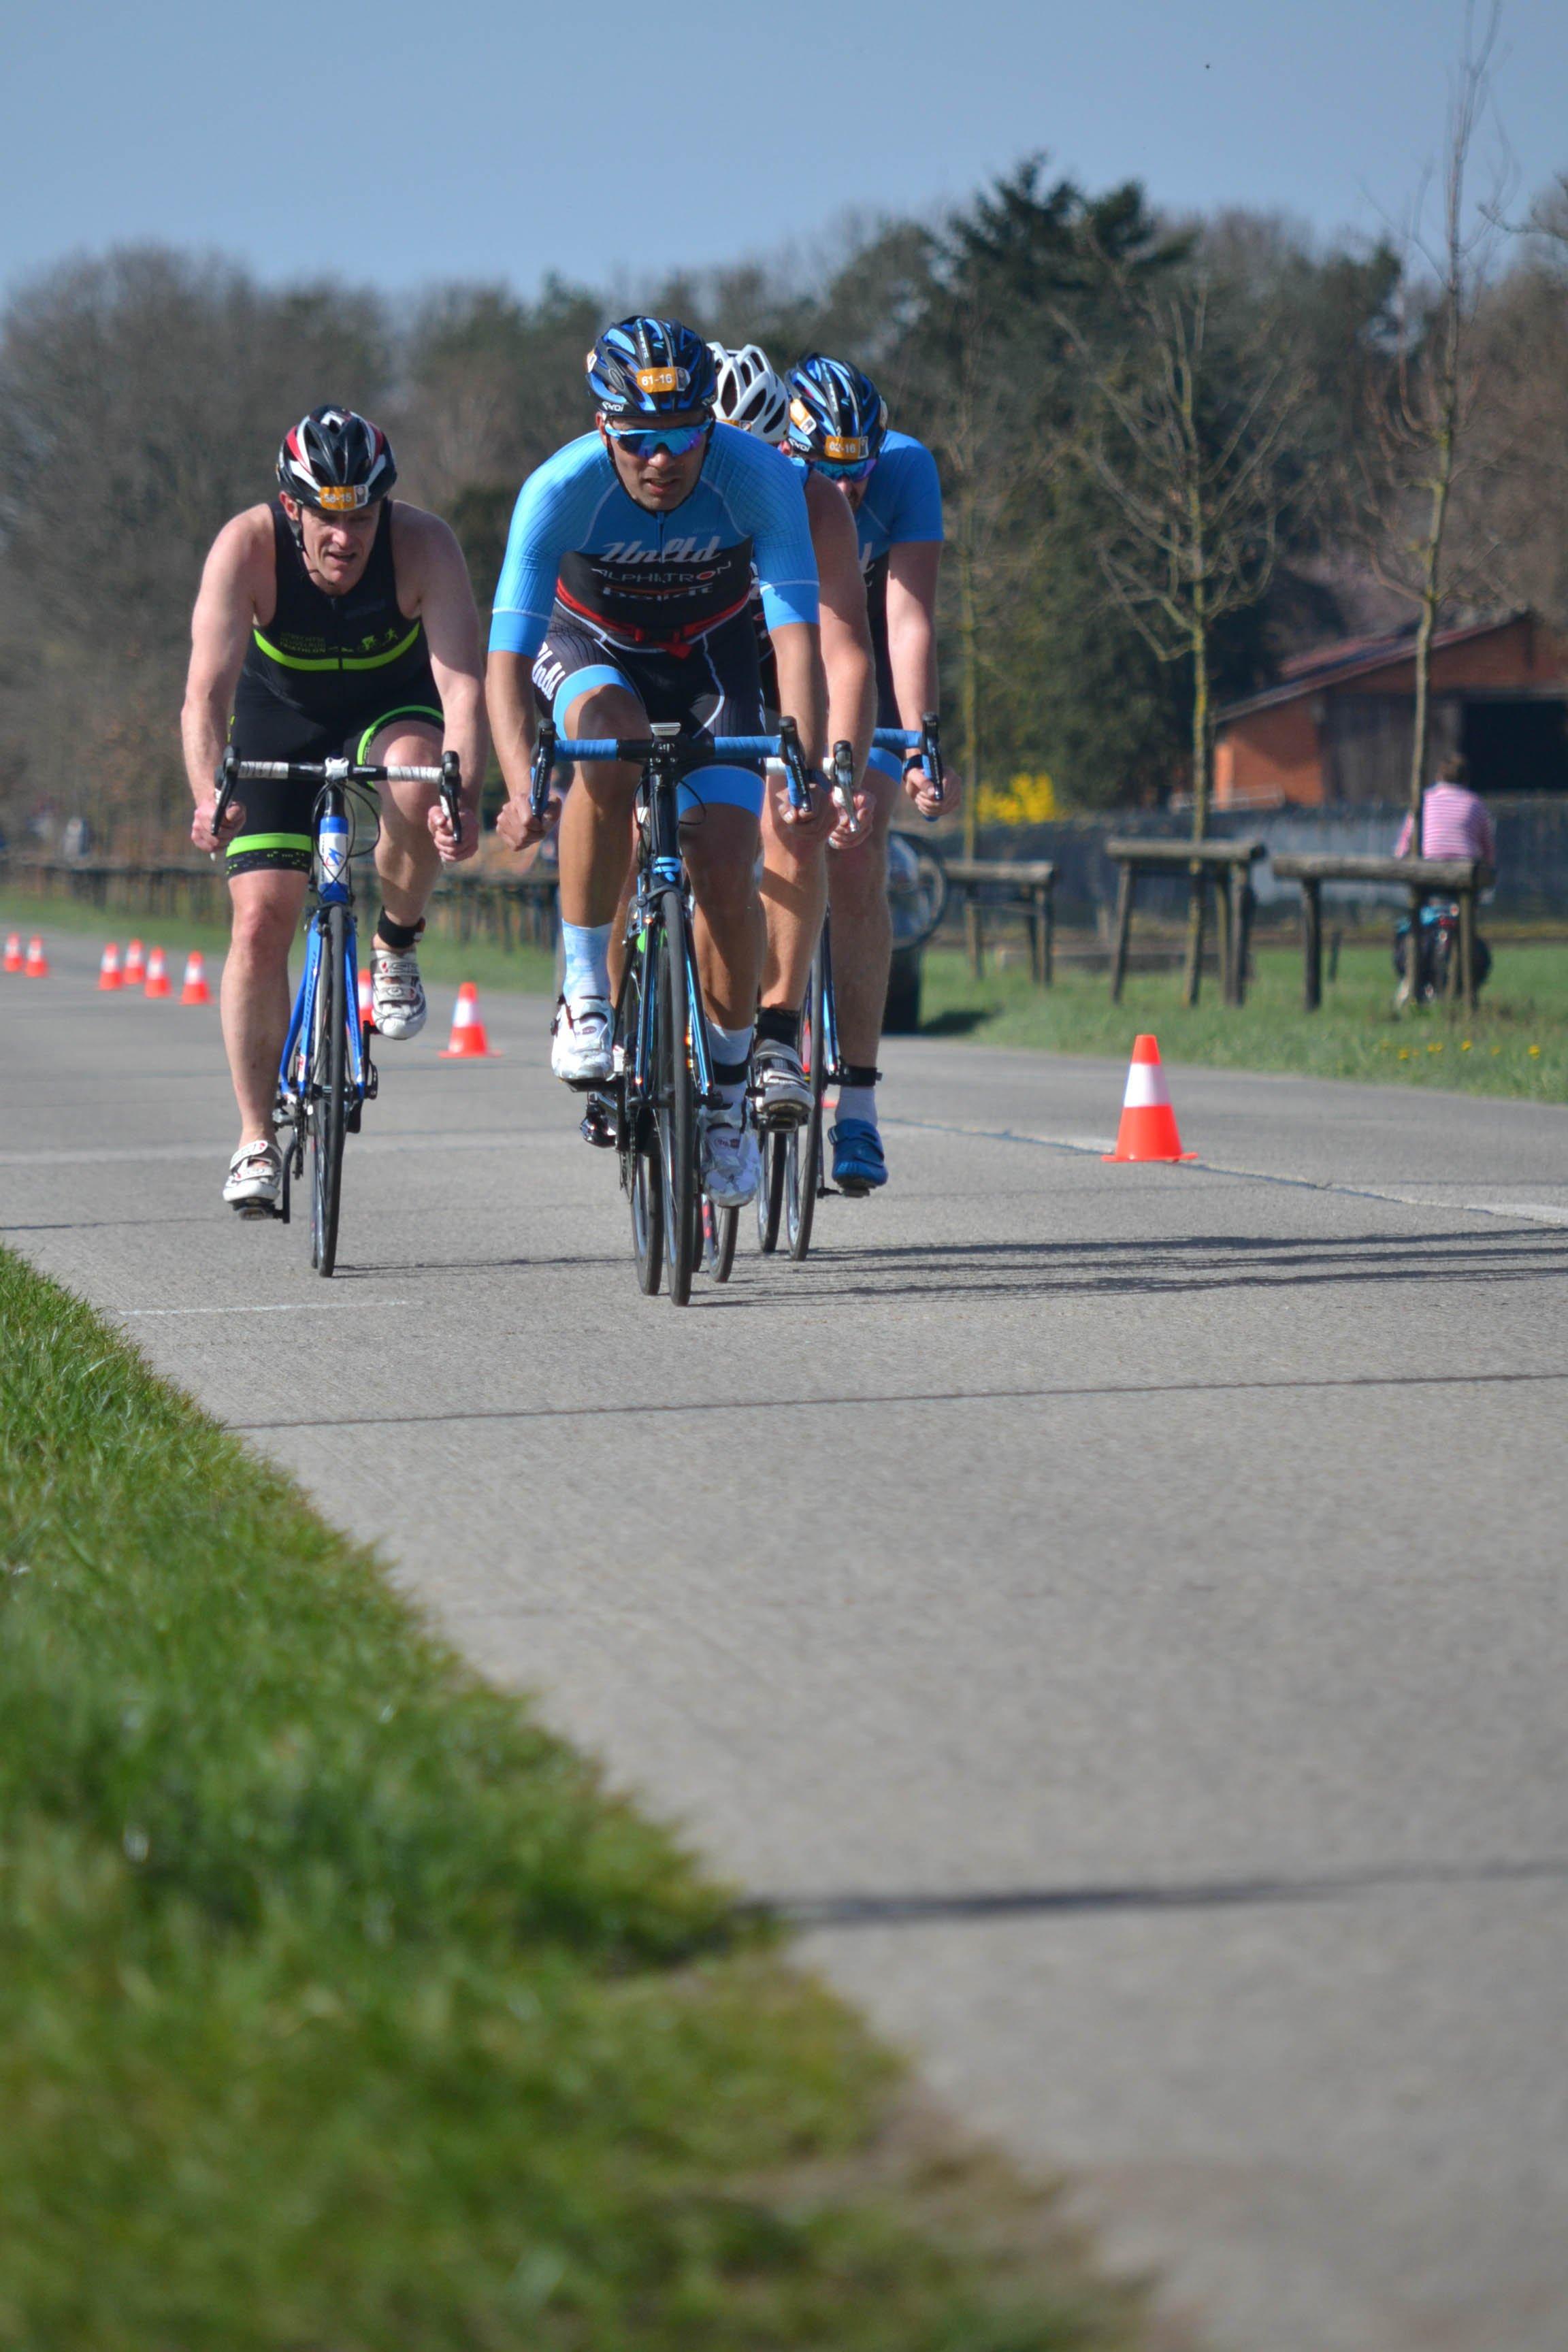 competitie - UHTT Run Bike Run Team Geel Ruud Fiets - UHTT Run Bike Run Team verrassend 11e in Challenge Duathlon Geel - raceverslag, Nederland, Hardlopen, Fietsen, competitie, 2018